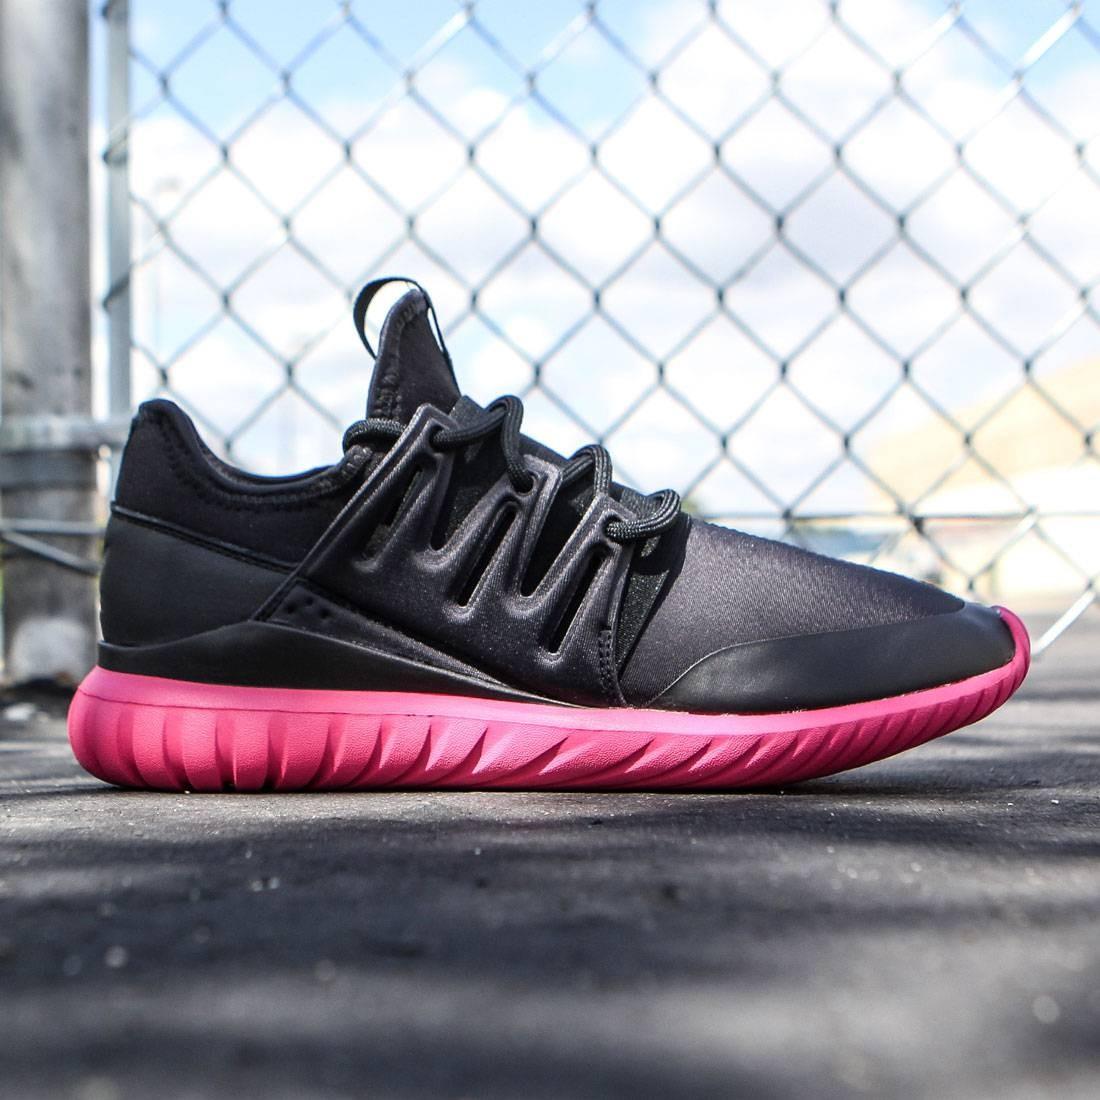 74667aa9196 Original Cheap Adidas ultra boost 3.0 triple black size 13 Turtle Dove  Online